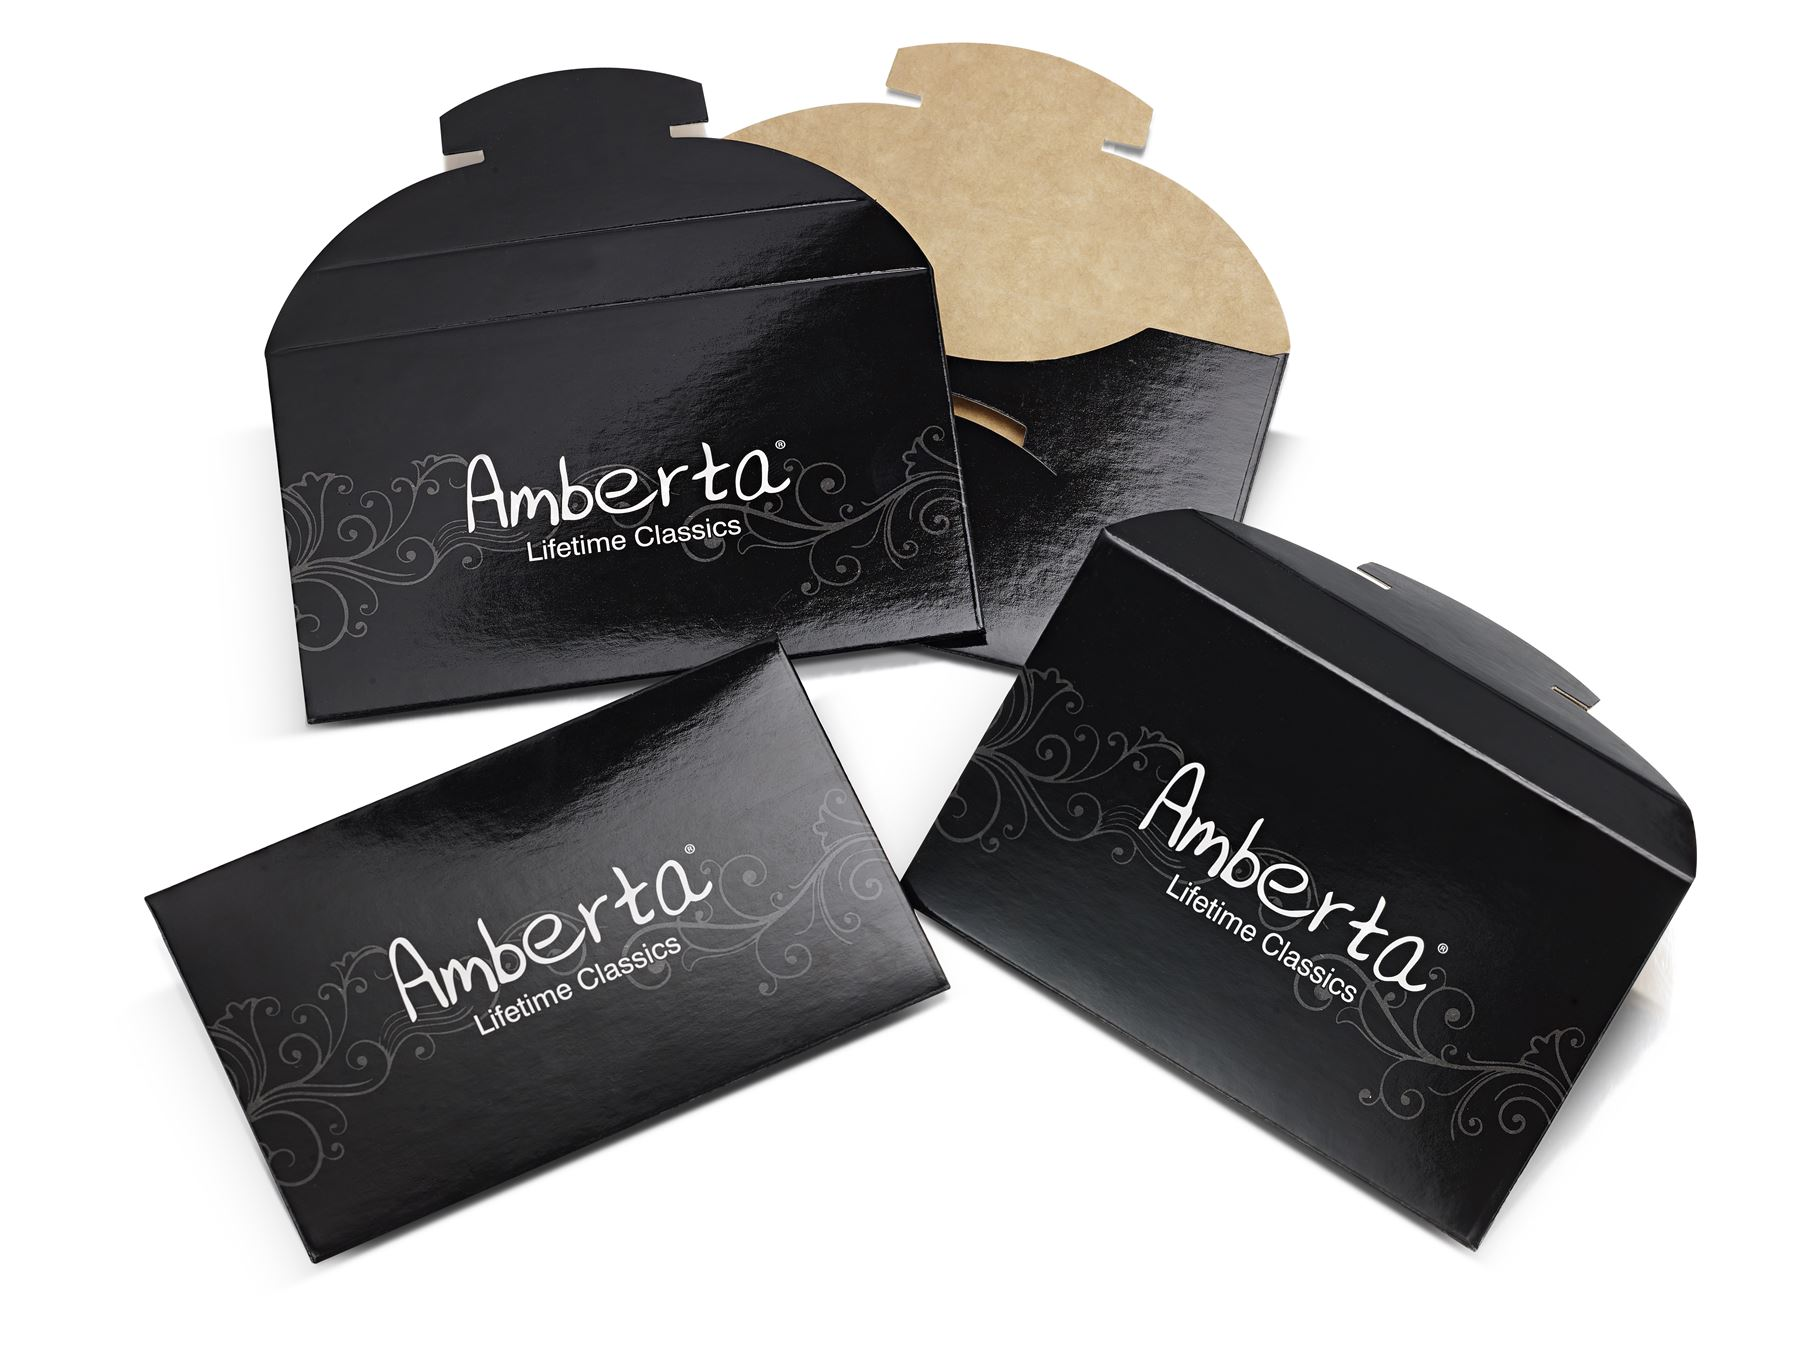 Amberta-Jewelry-925-Sterling-Silver-Adjustable-Bracelet-Italian-Bangle-for-Women miniature 37